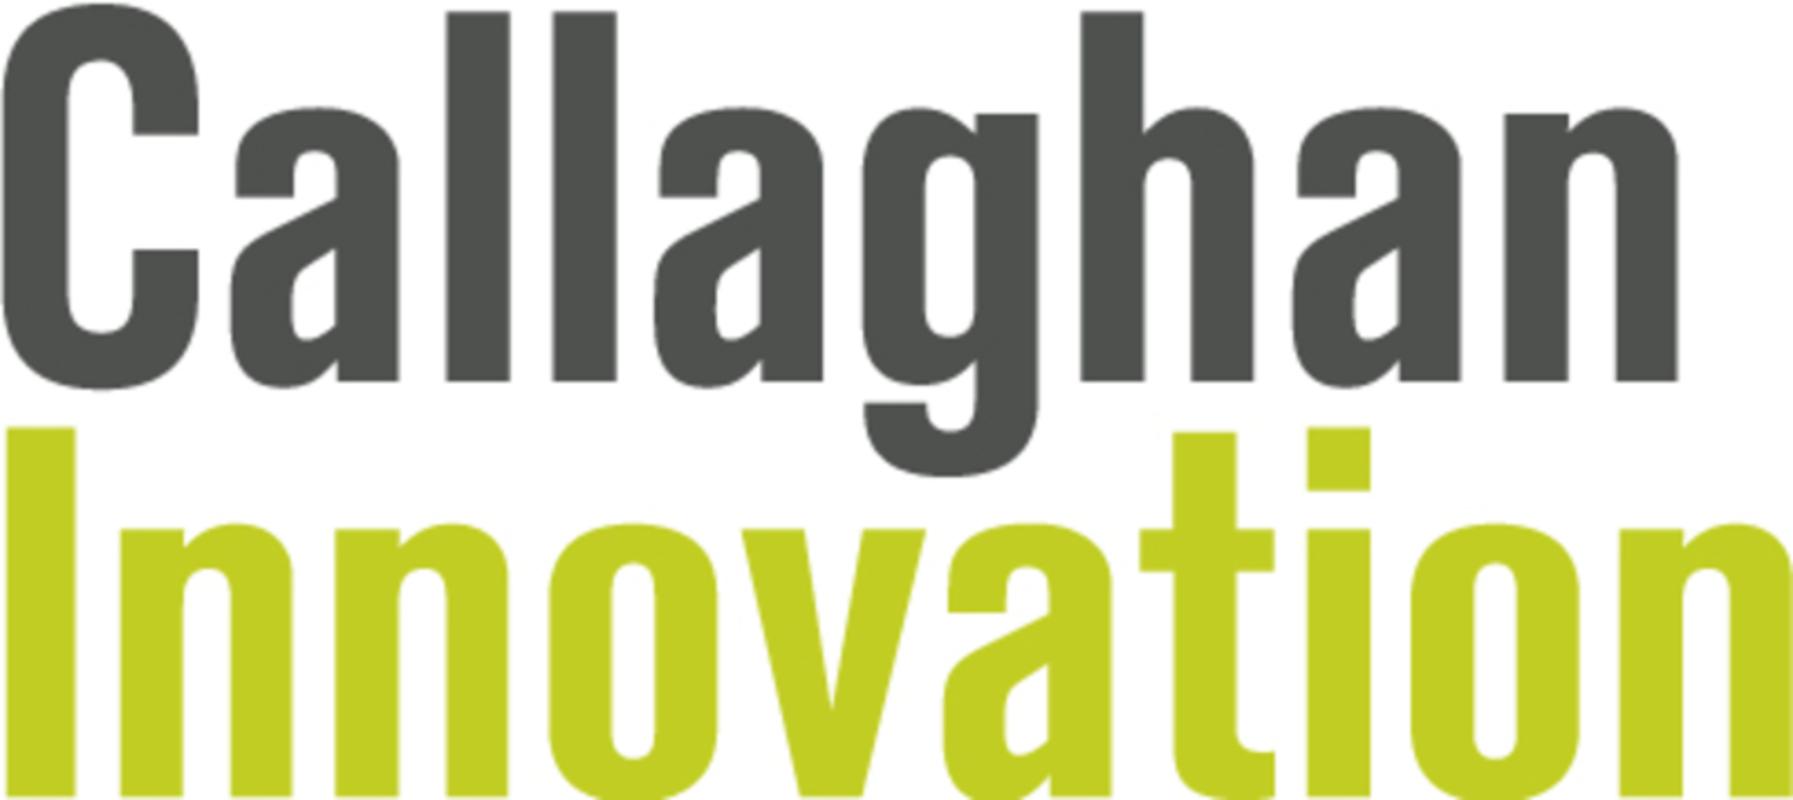 Callaghan logo 2013 vert rgb